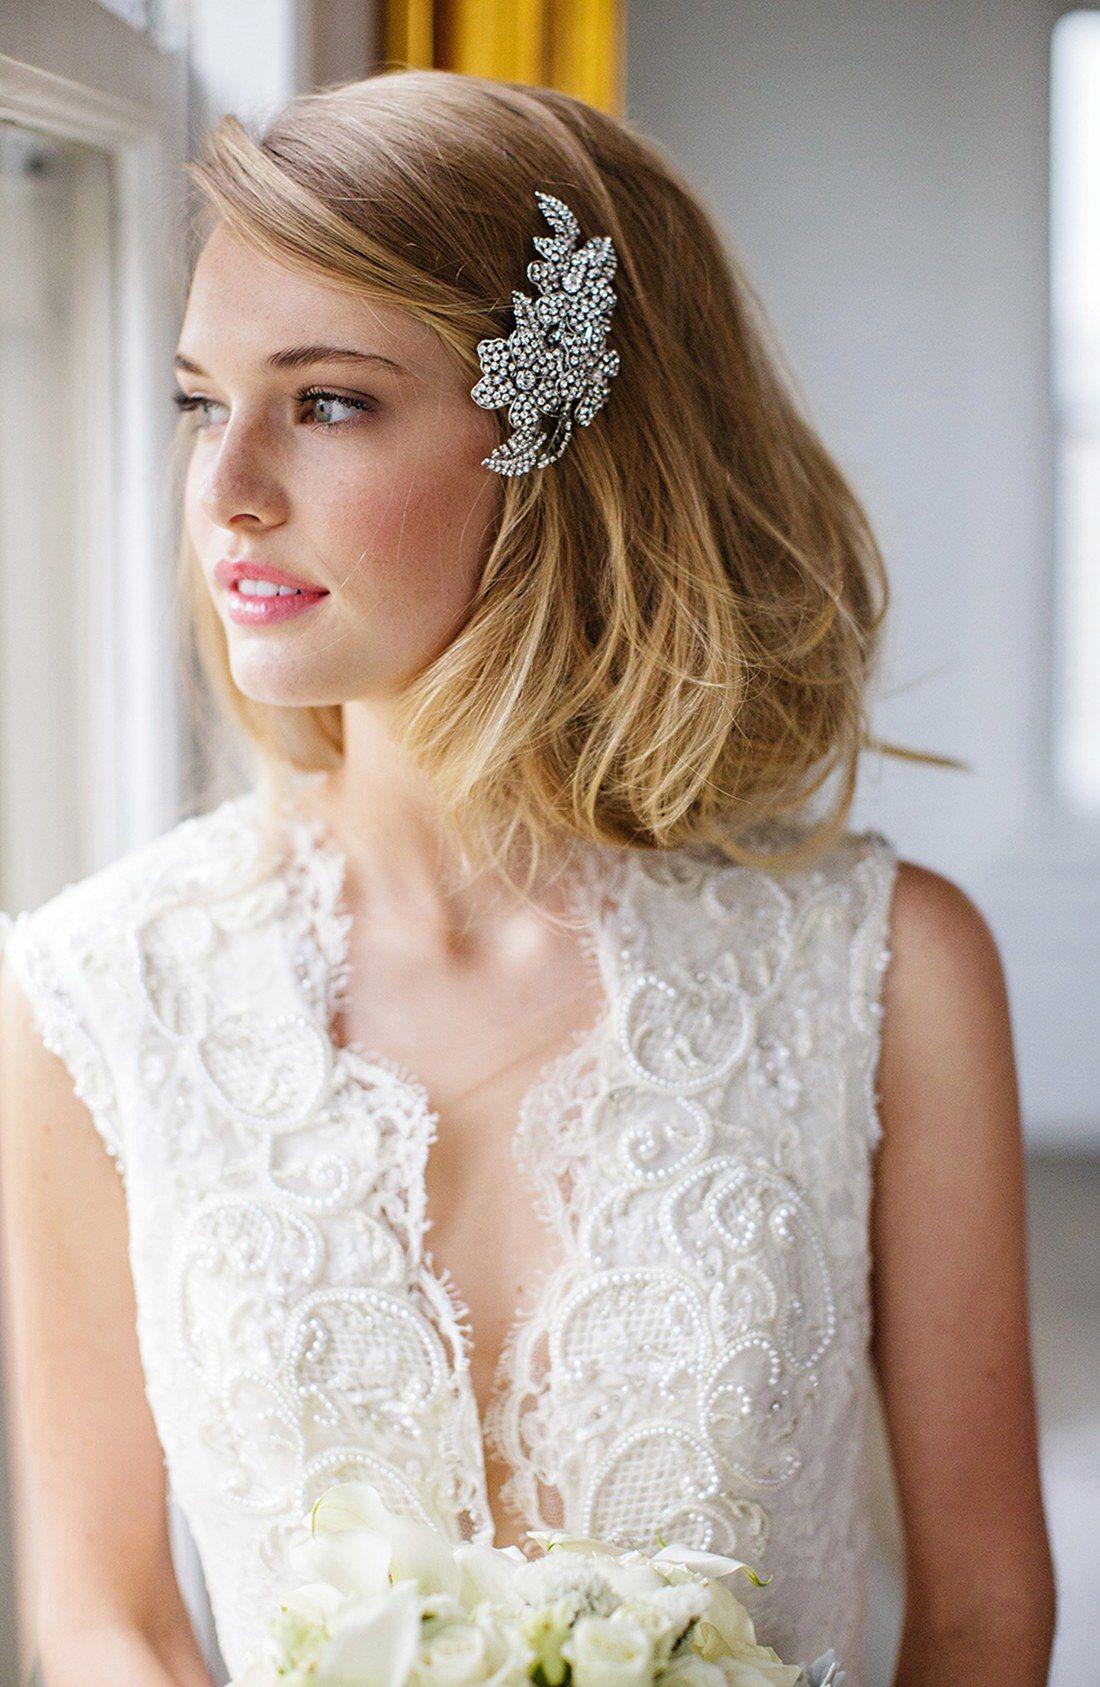 17 Stylish Chic Hair Accessories For Bridal Bob Or Lob Bride Hairstyles Bride Hair Pins Wedding Hairstyles